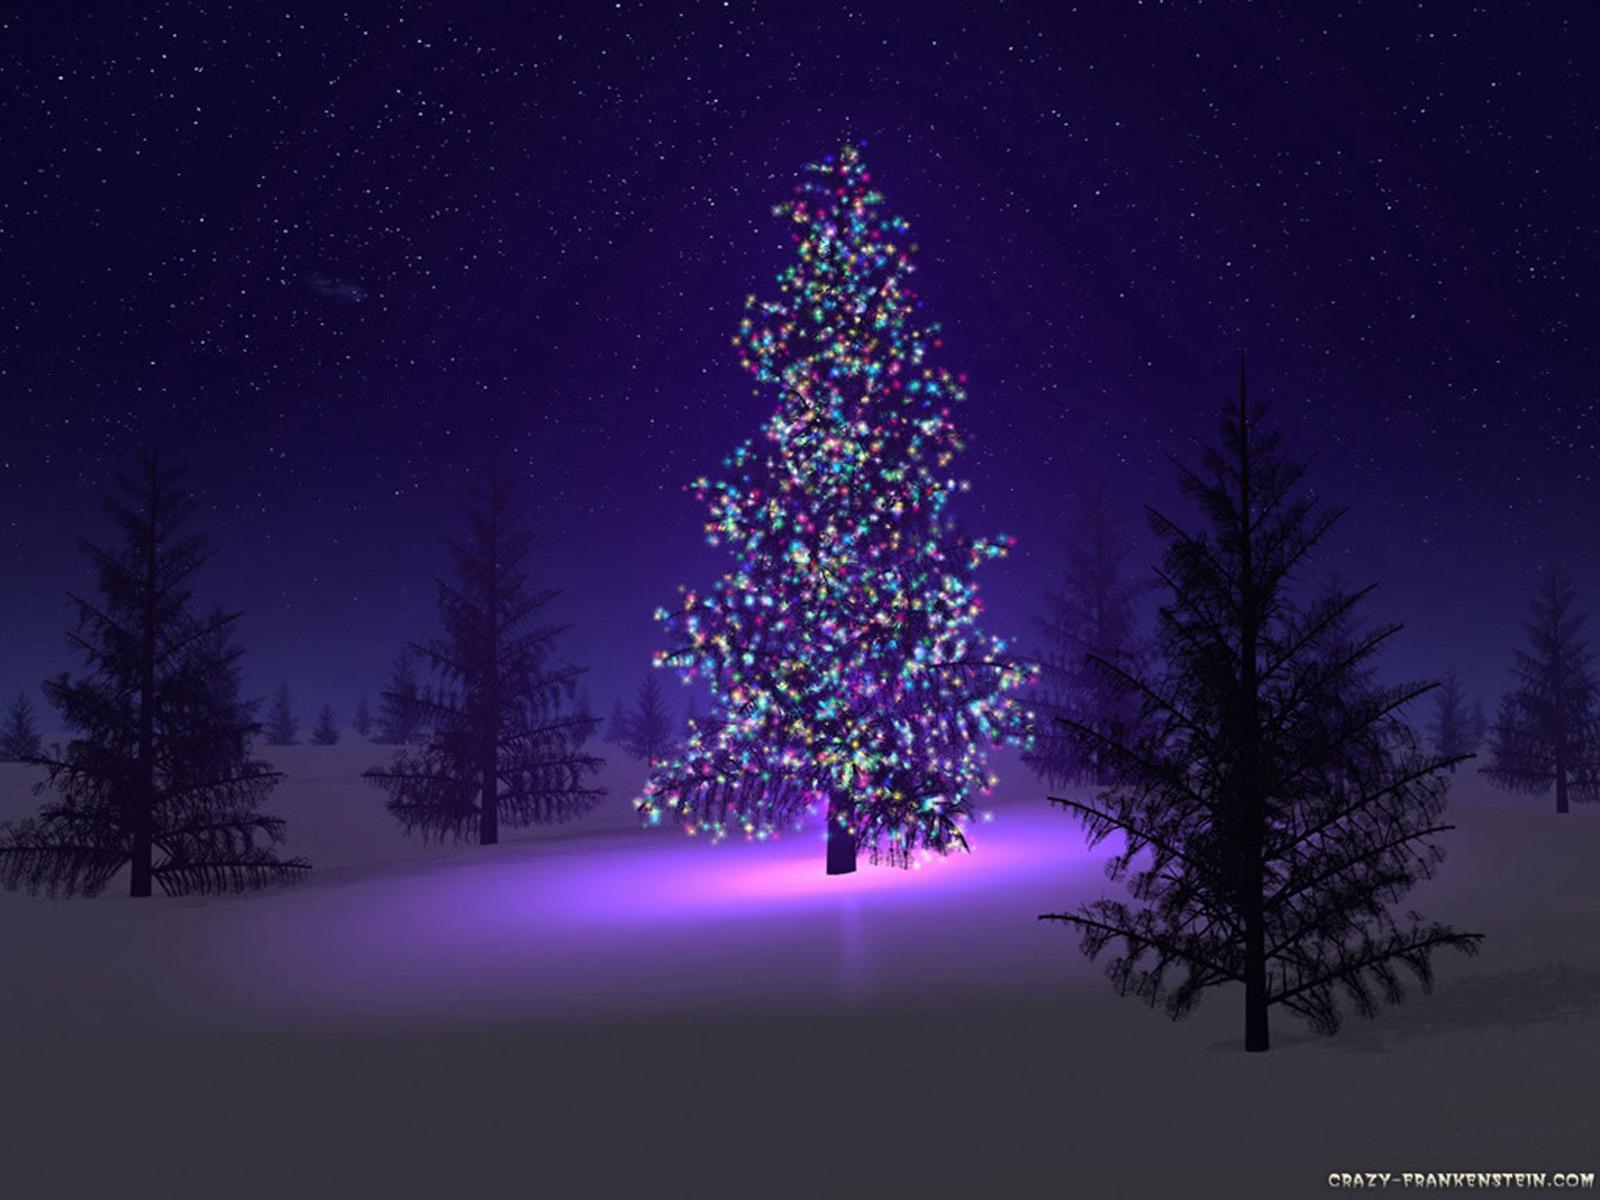 Salman Hd Wallpaper Wallpaper Backgrounds Beautiful Christmas Trees